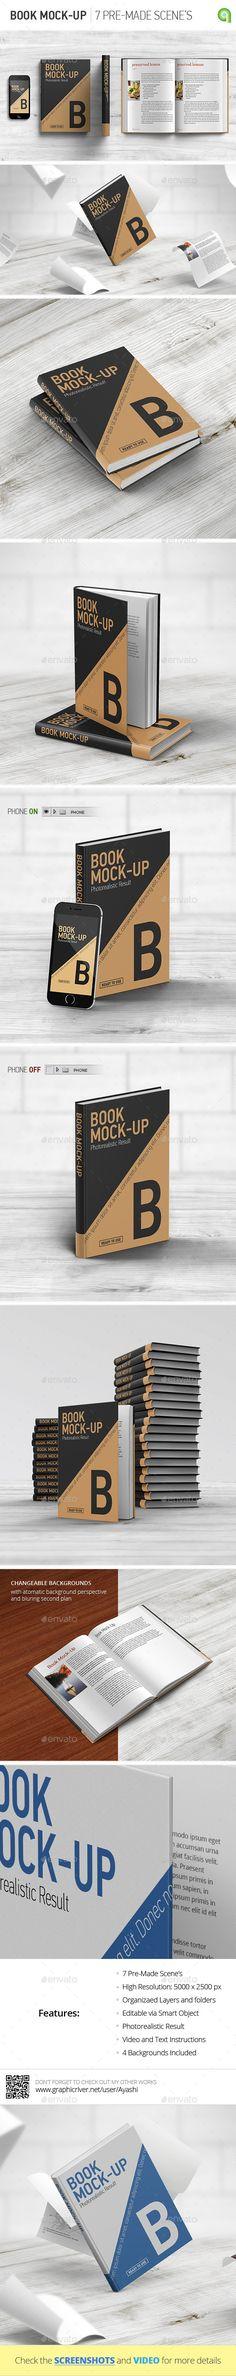 Book Mock-Up | #bookmockup #mockup | Download: http://graphicriver.net/item/book-mockup/8954816?ref=ksioks